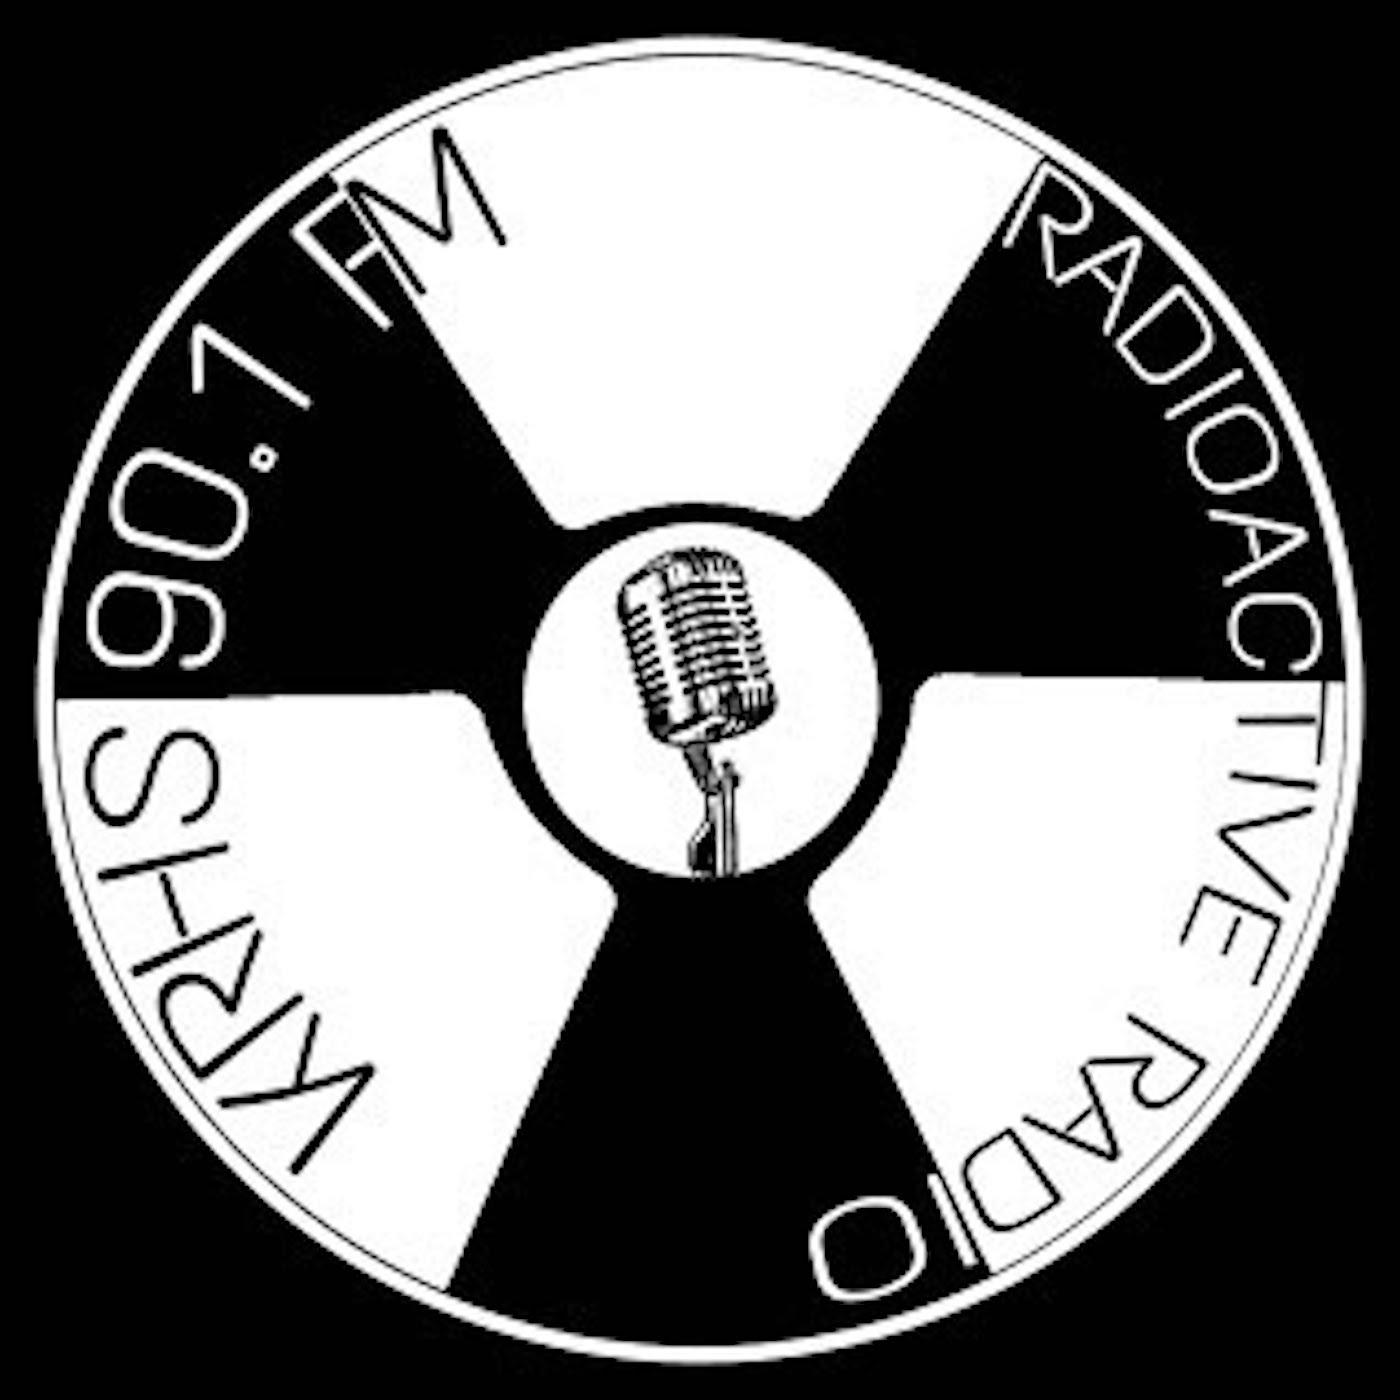 KRHS 90.1 FM Radioactive Radio